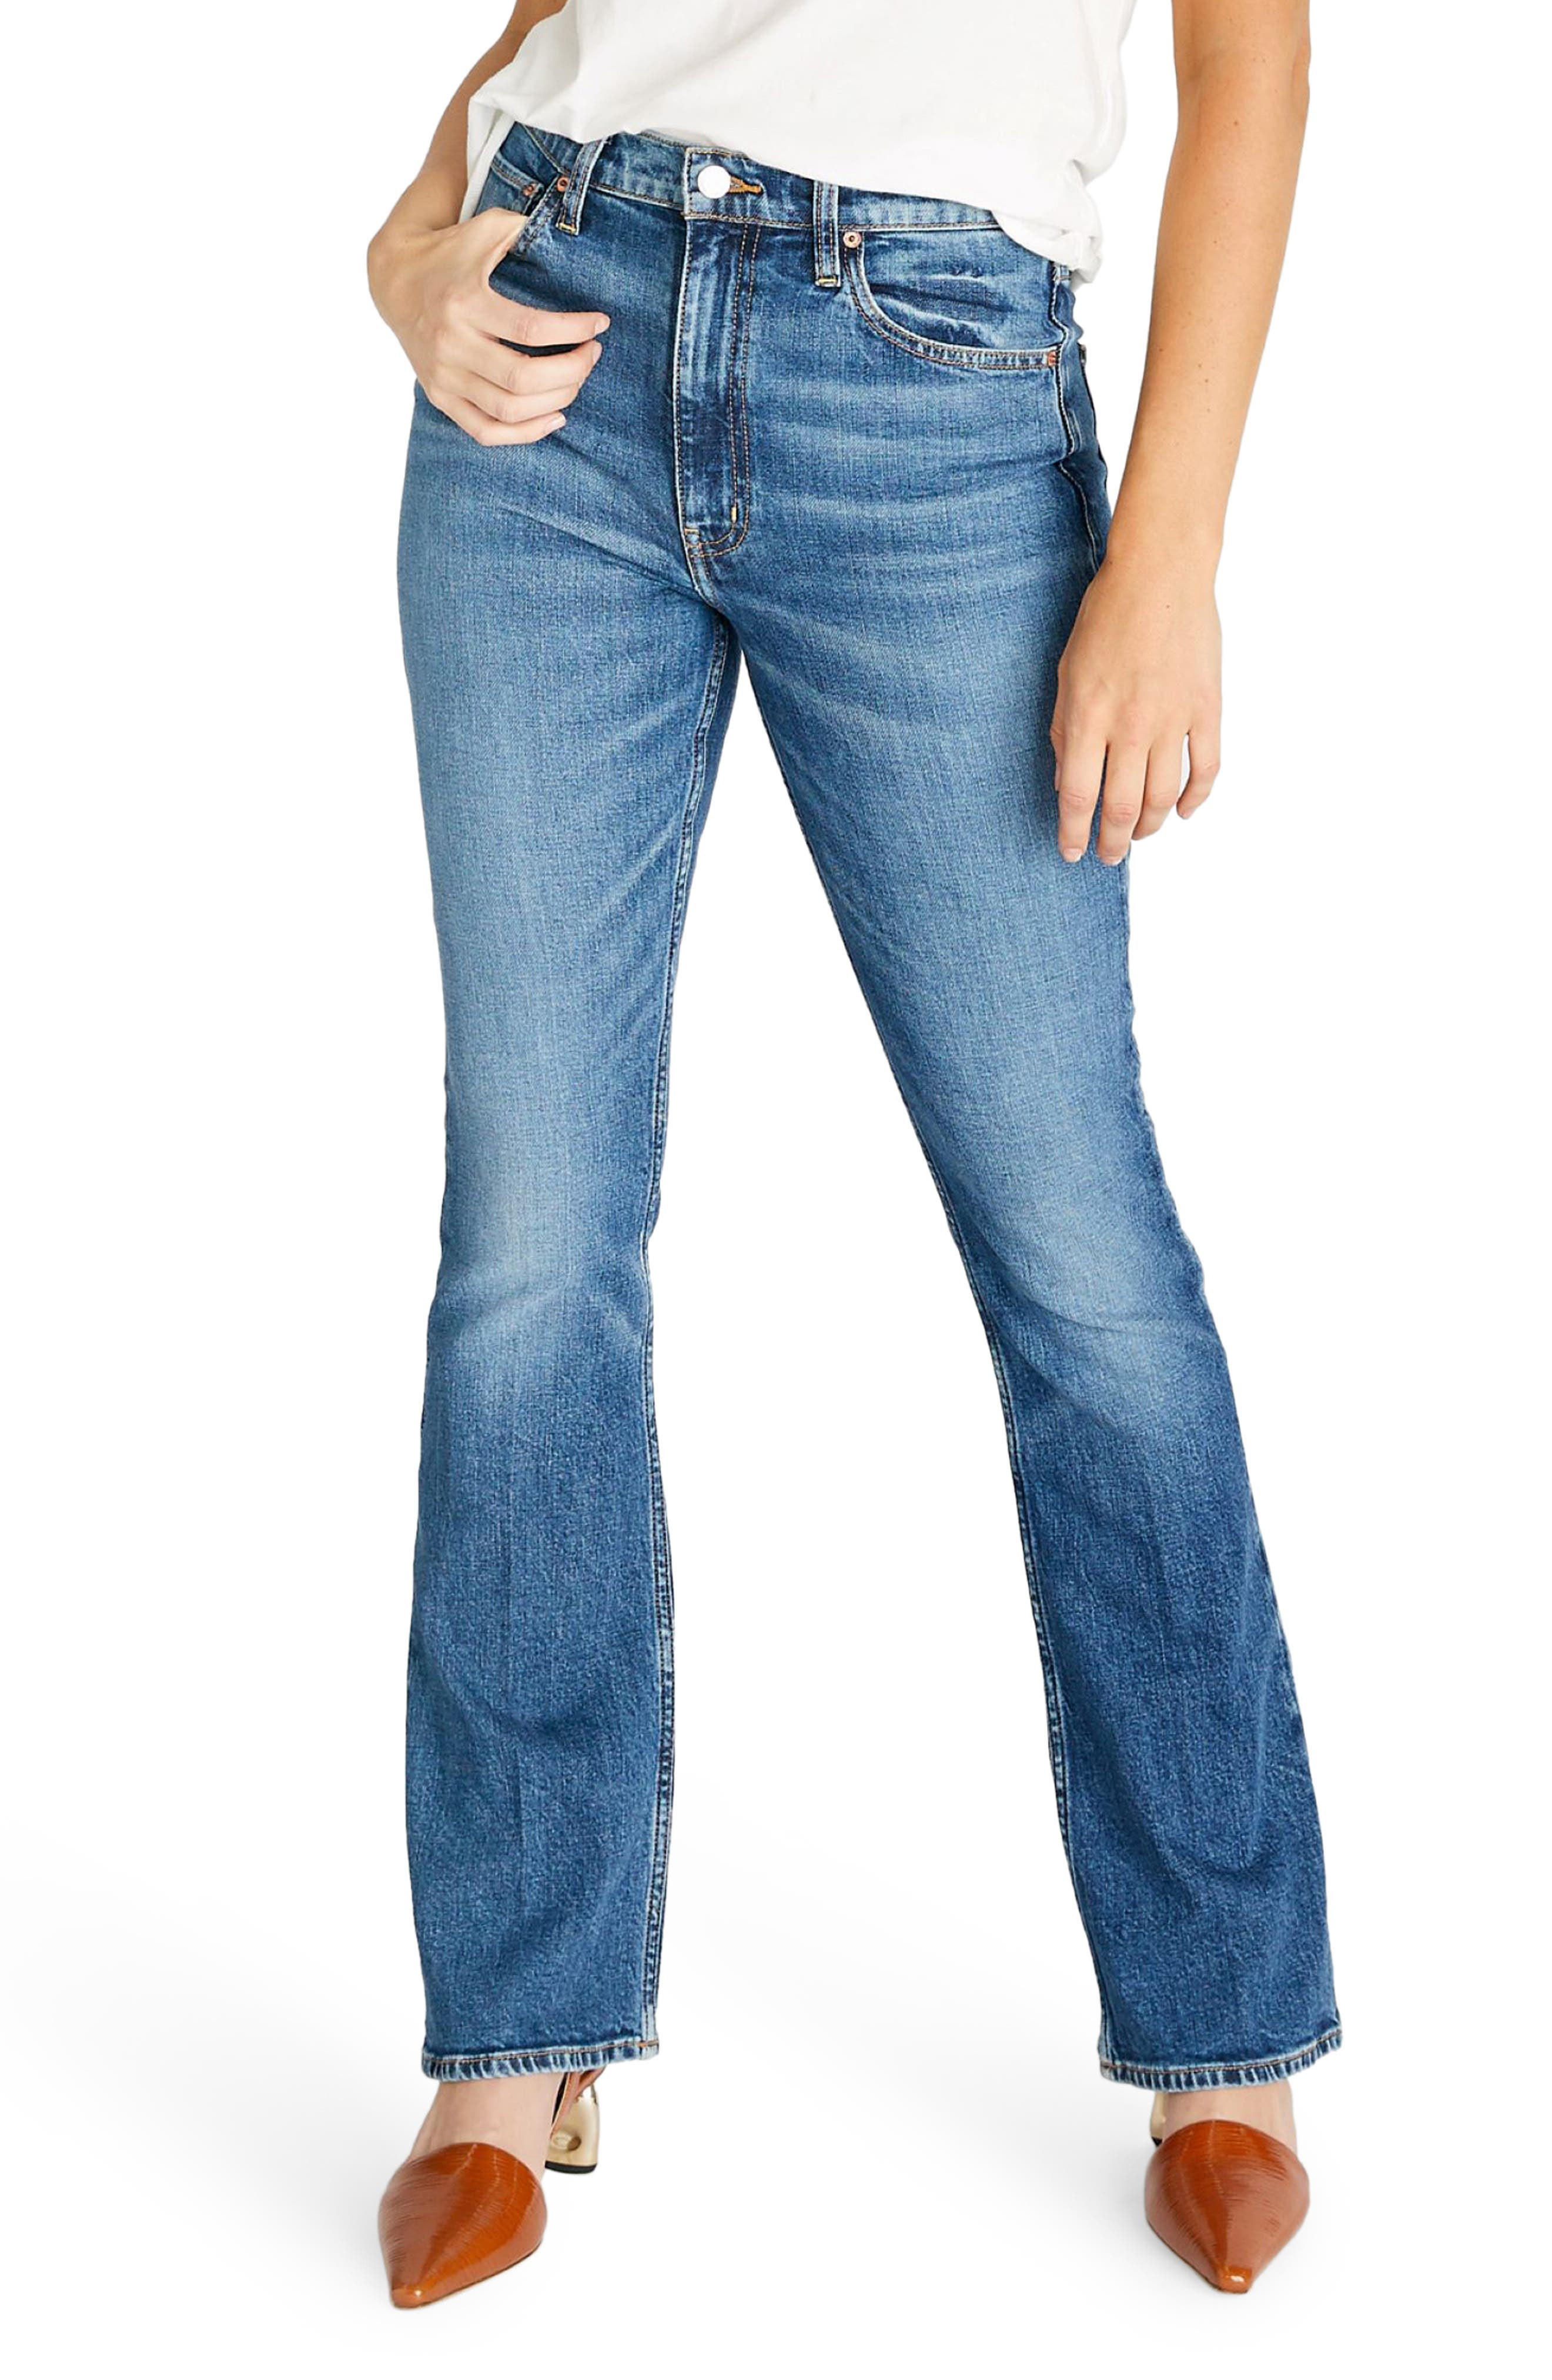 aTICA Women's Etica Sasha High Waist Flare Jeans